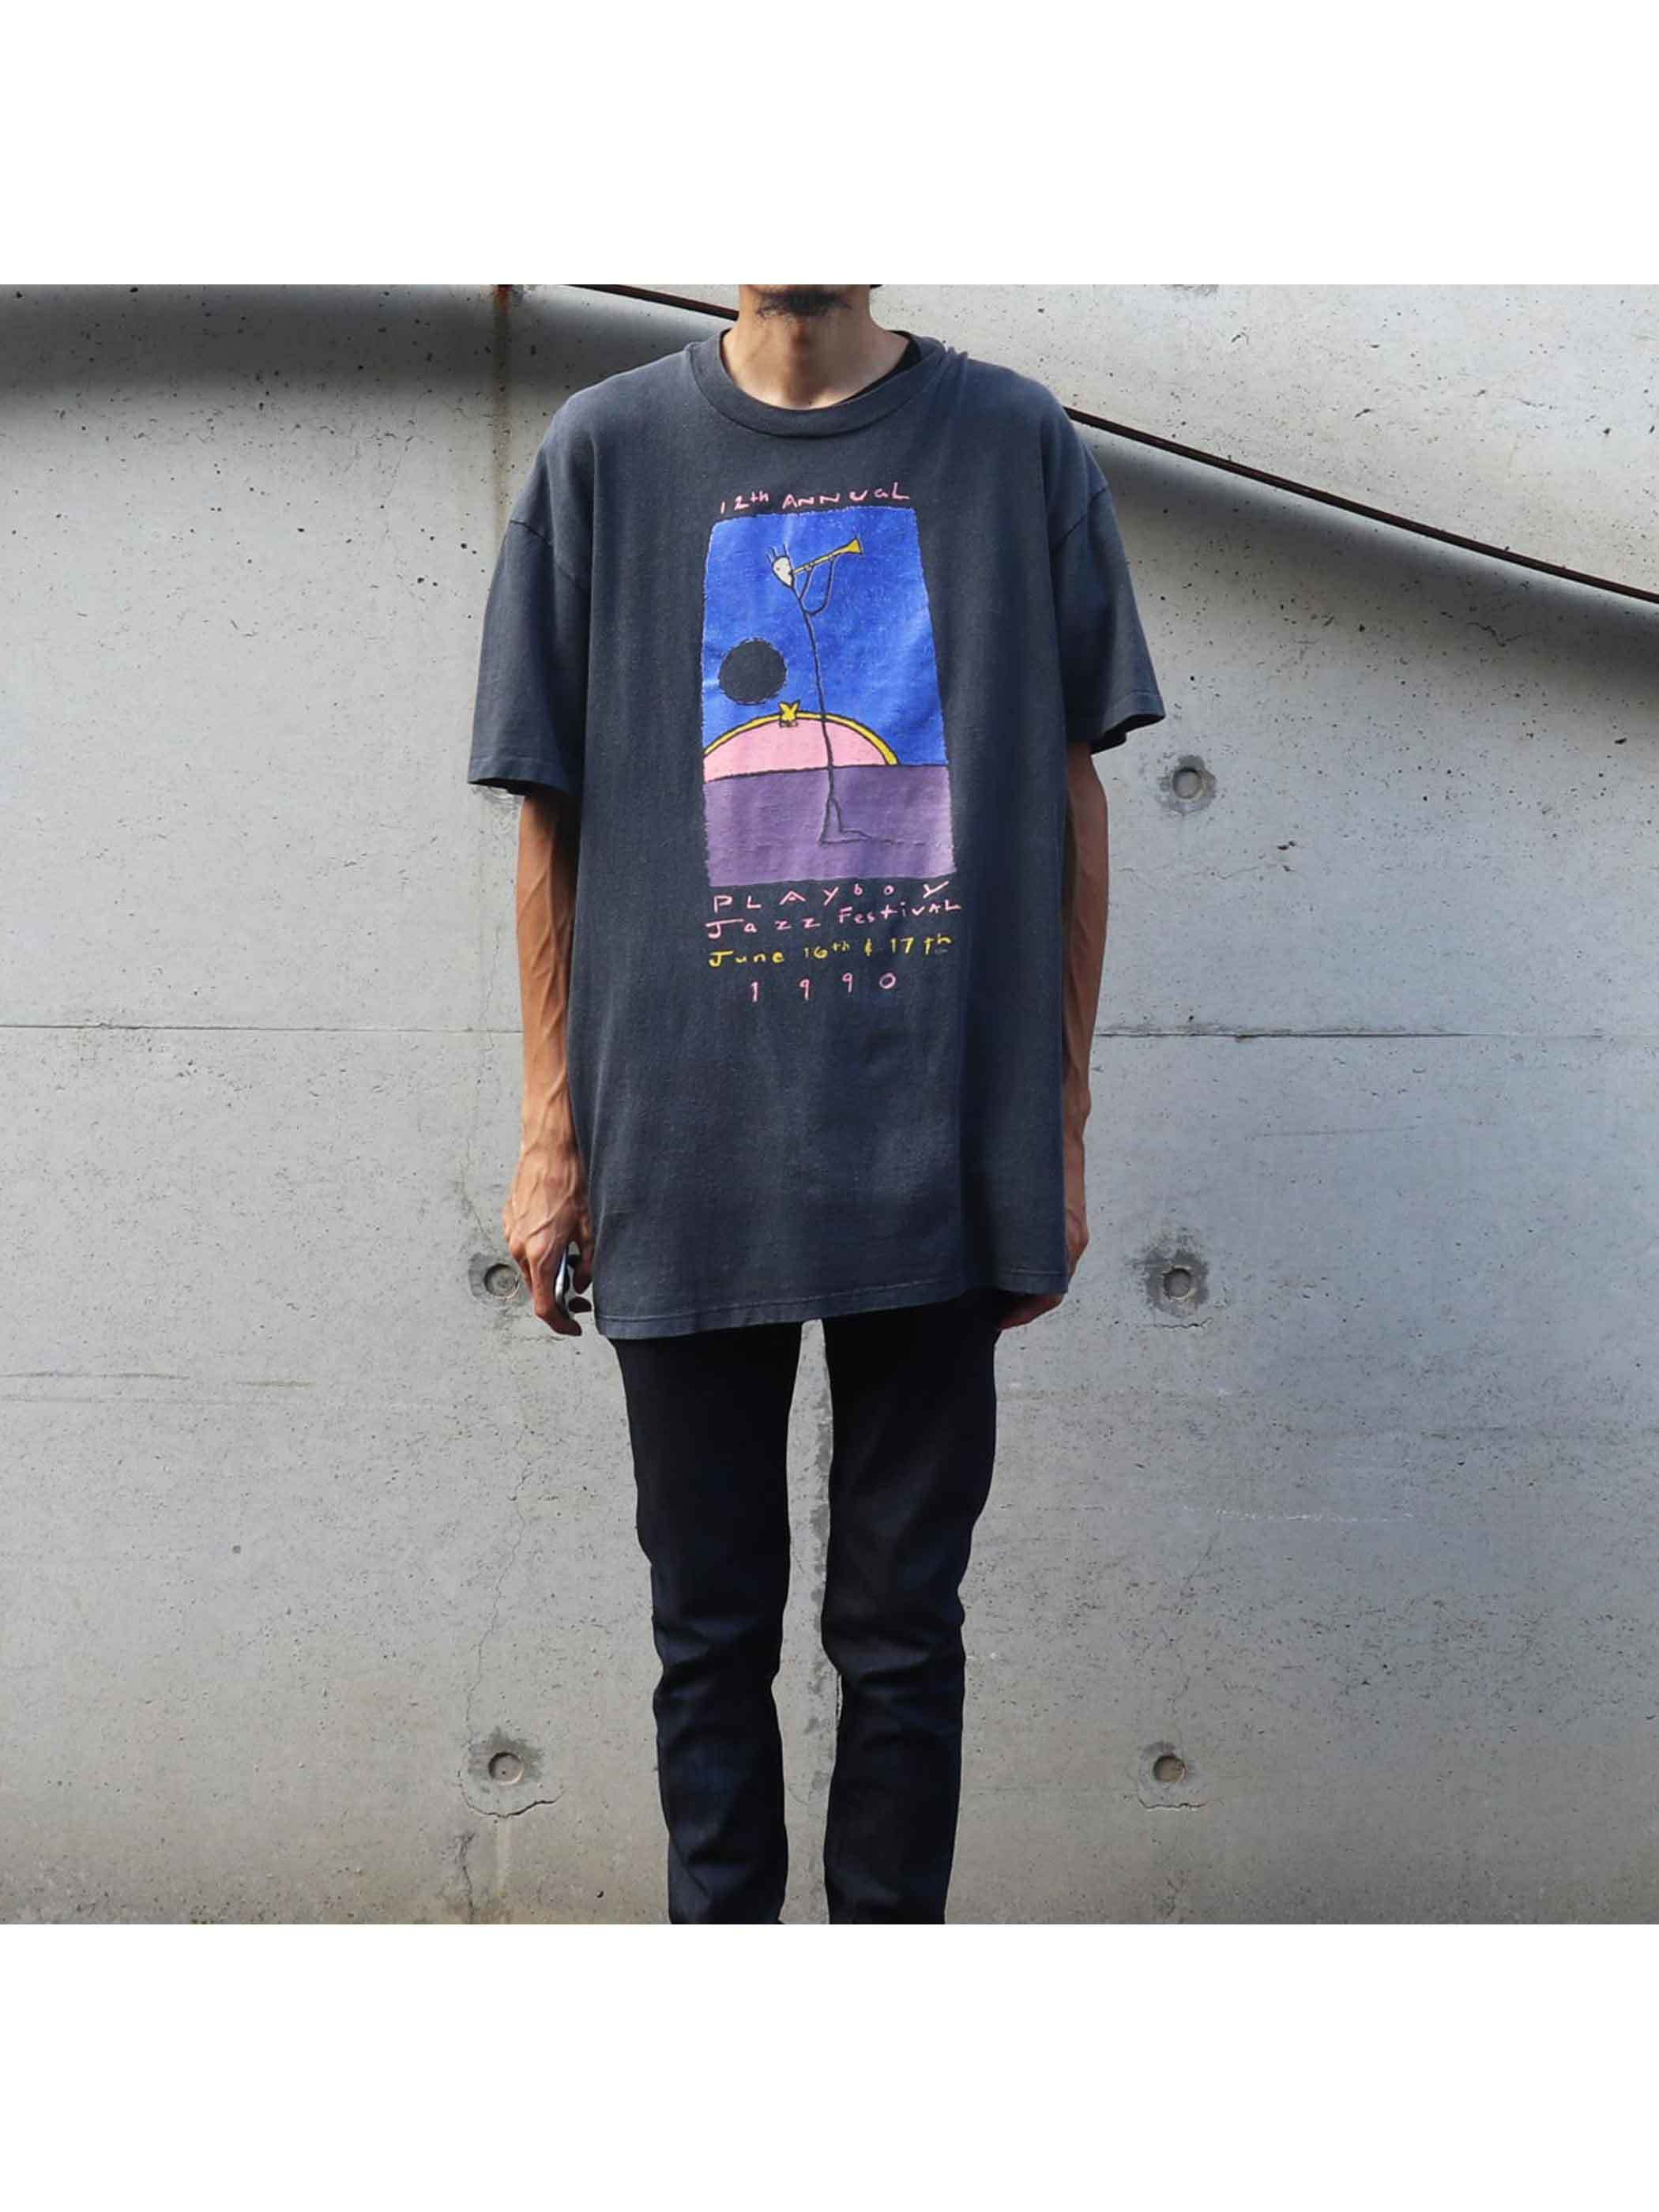 90's PLAYBOY JAZZ FESTIVAL プリントTシャツ [XL]